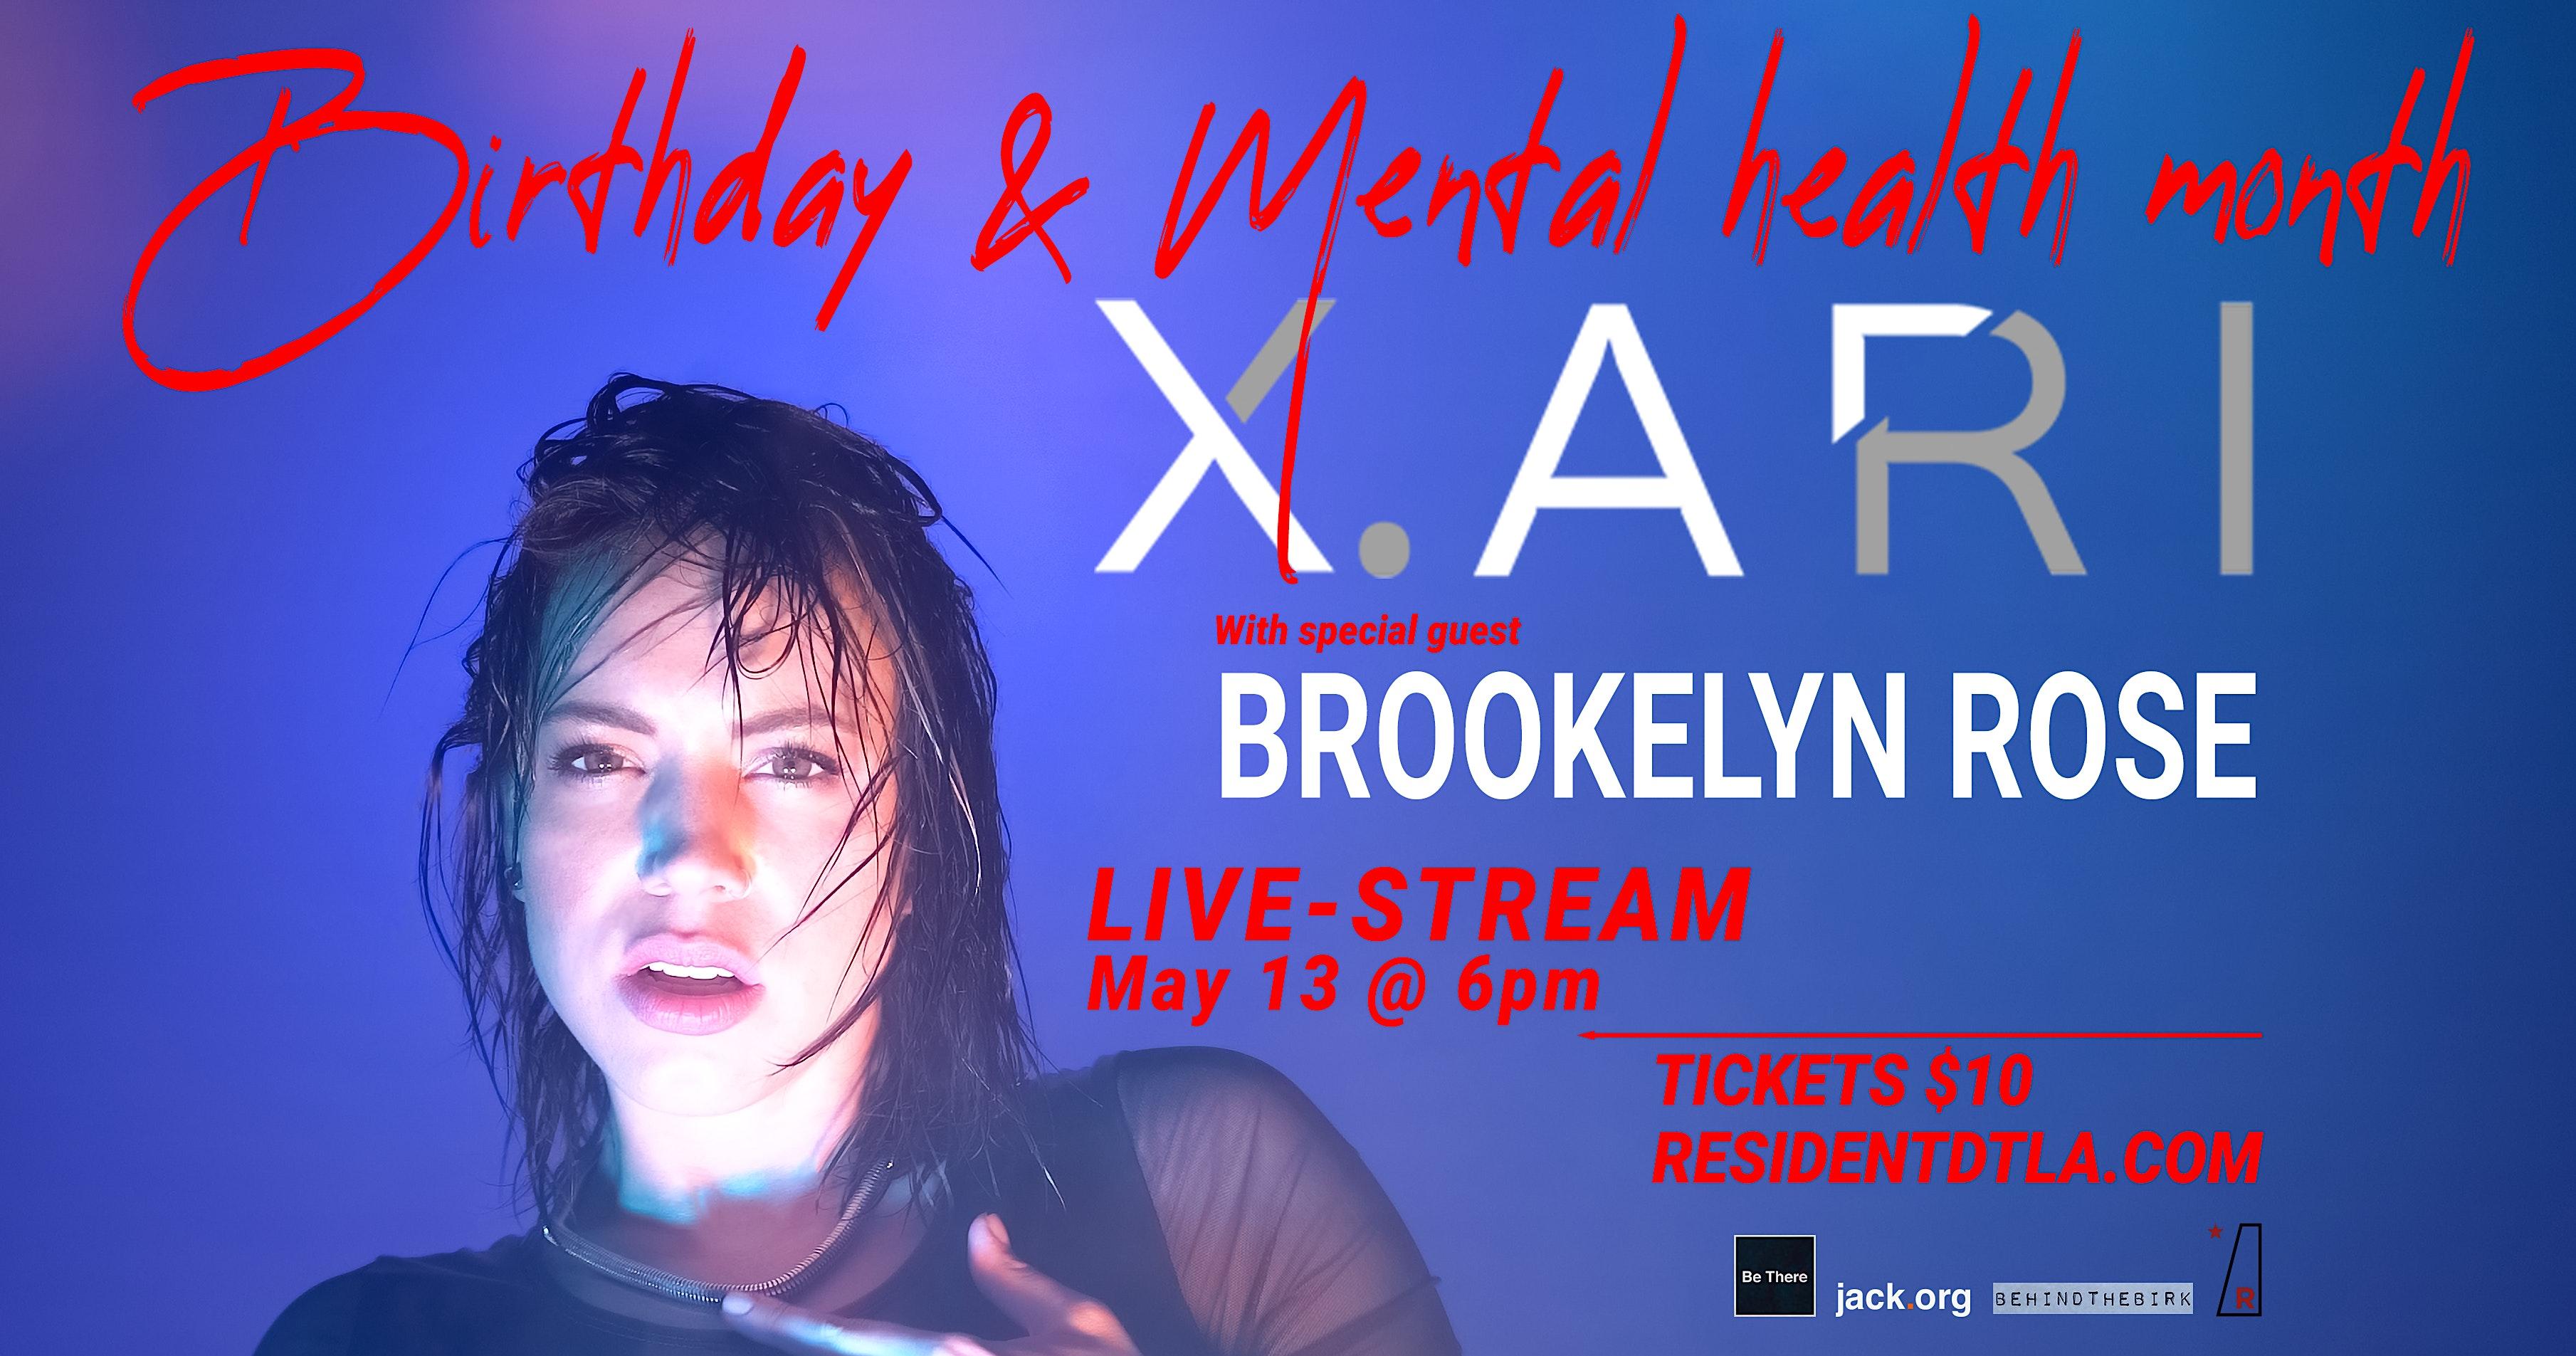 X.ARI Birthday & Mental Health Month Party